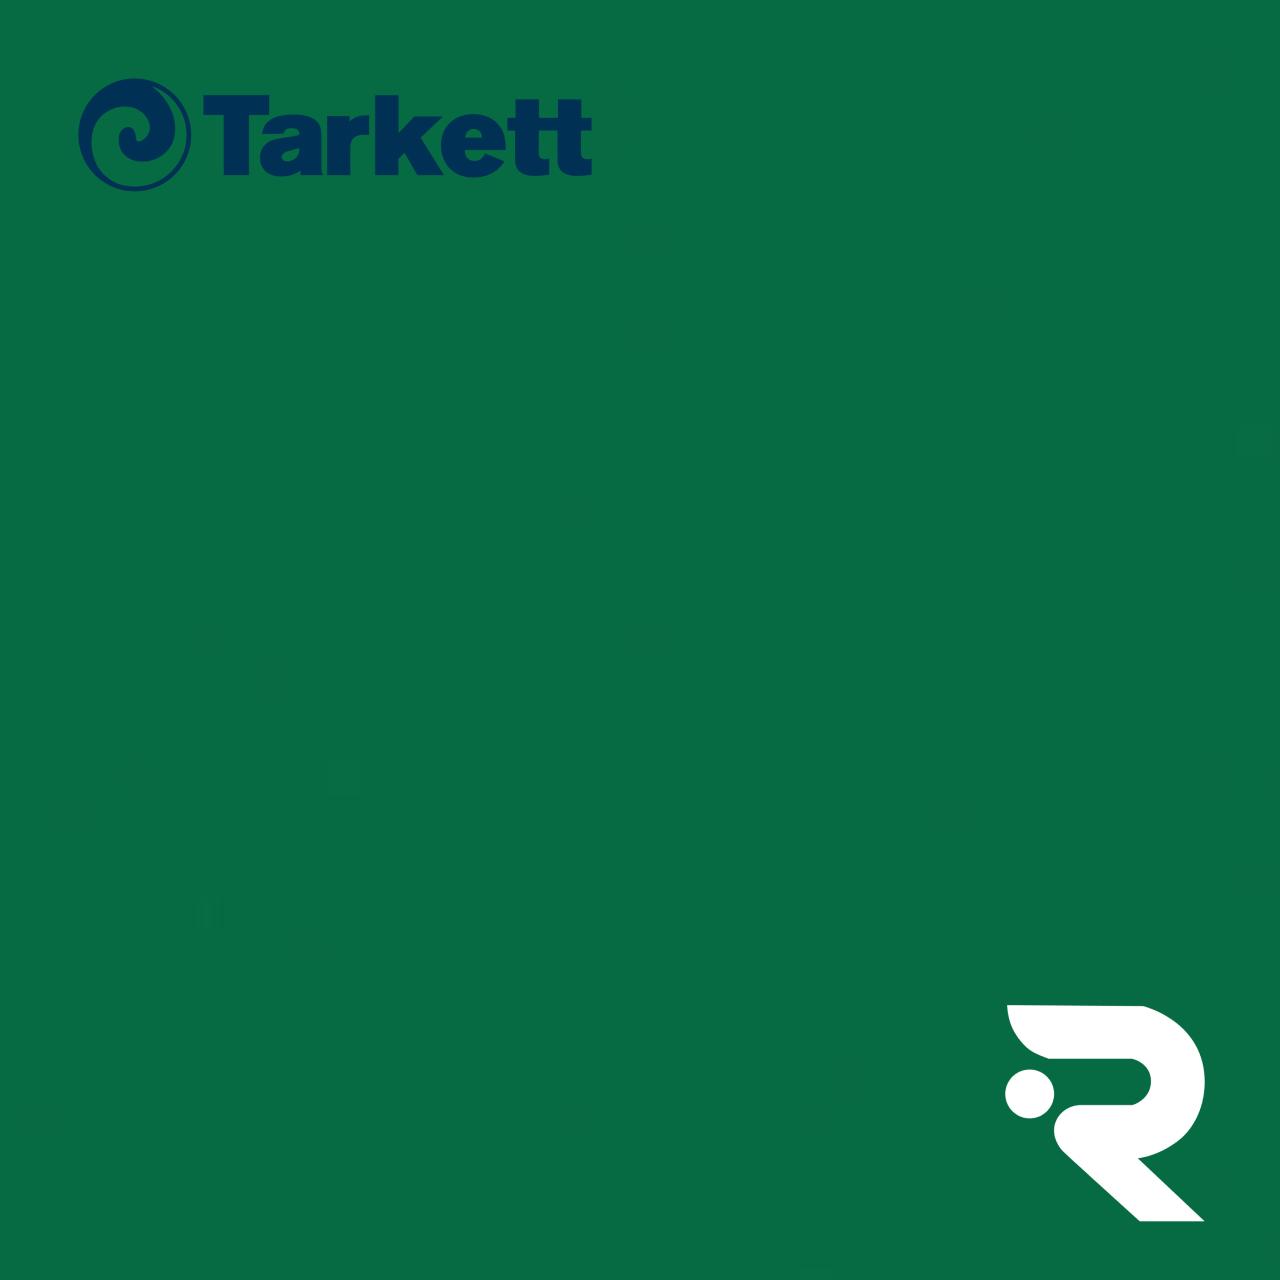 🏐 Спортивне покриття Tarkett   GREEN FIELD   OMNISPORTS V35   2 х 20.5 м